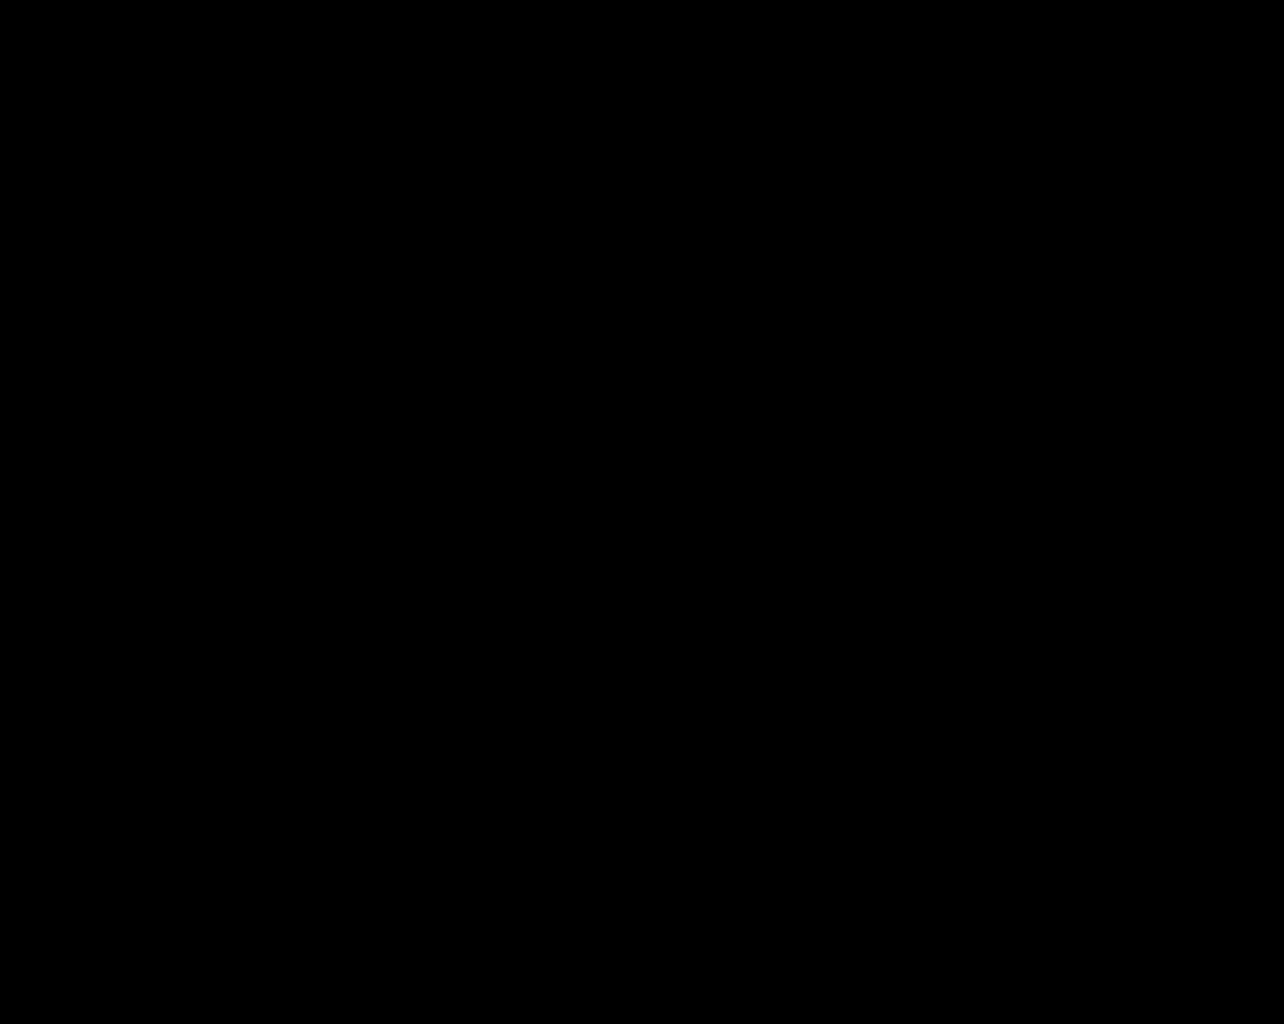 4-Ethylnaphthalen-1-yl-(1-pentylindol-3-yl)methanone